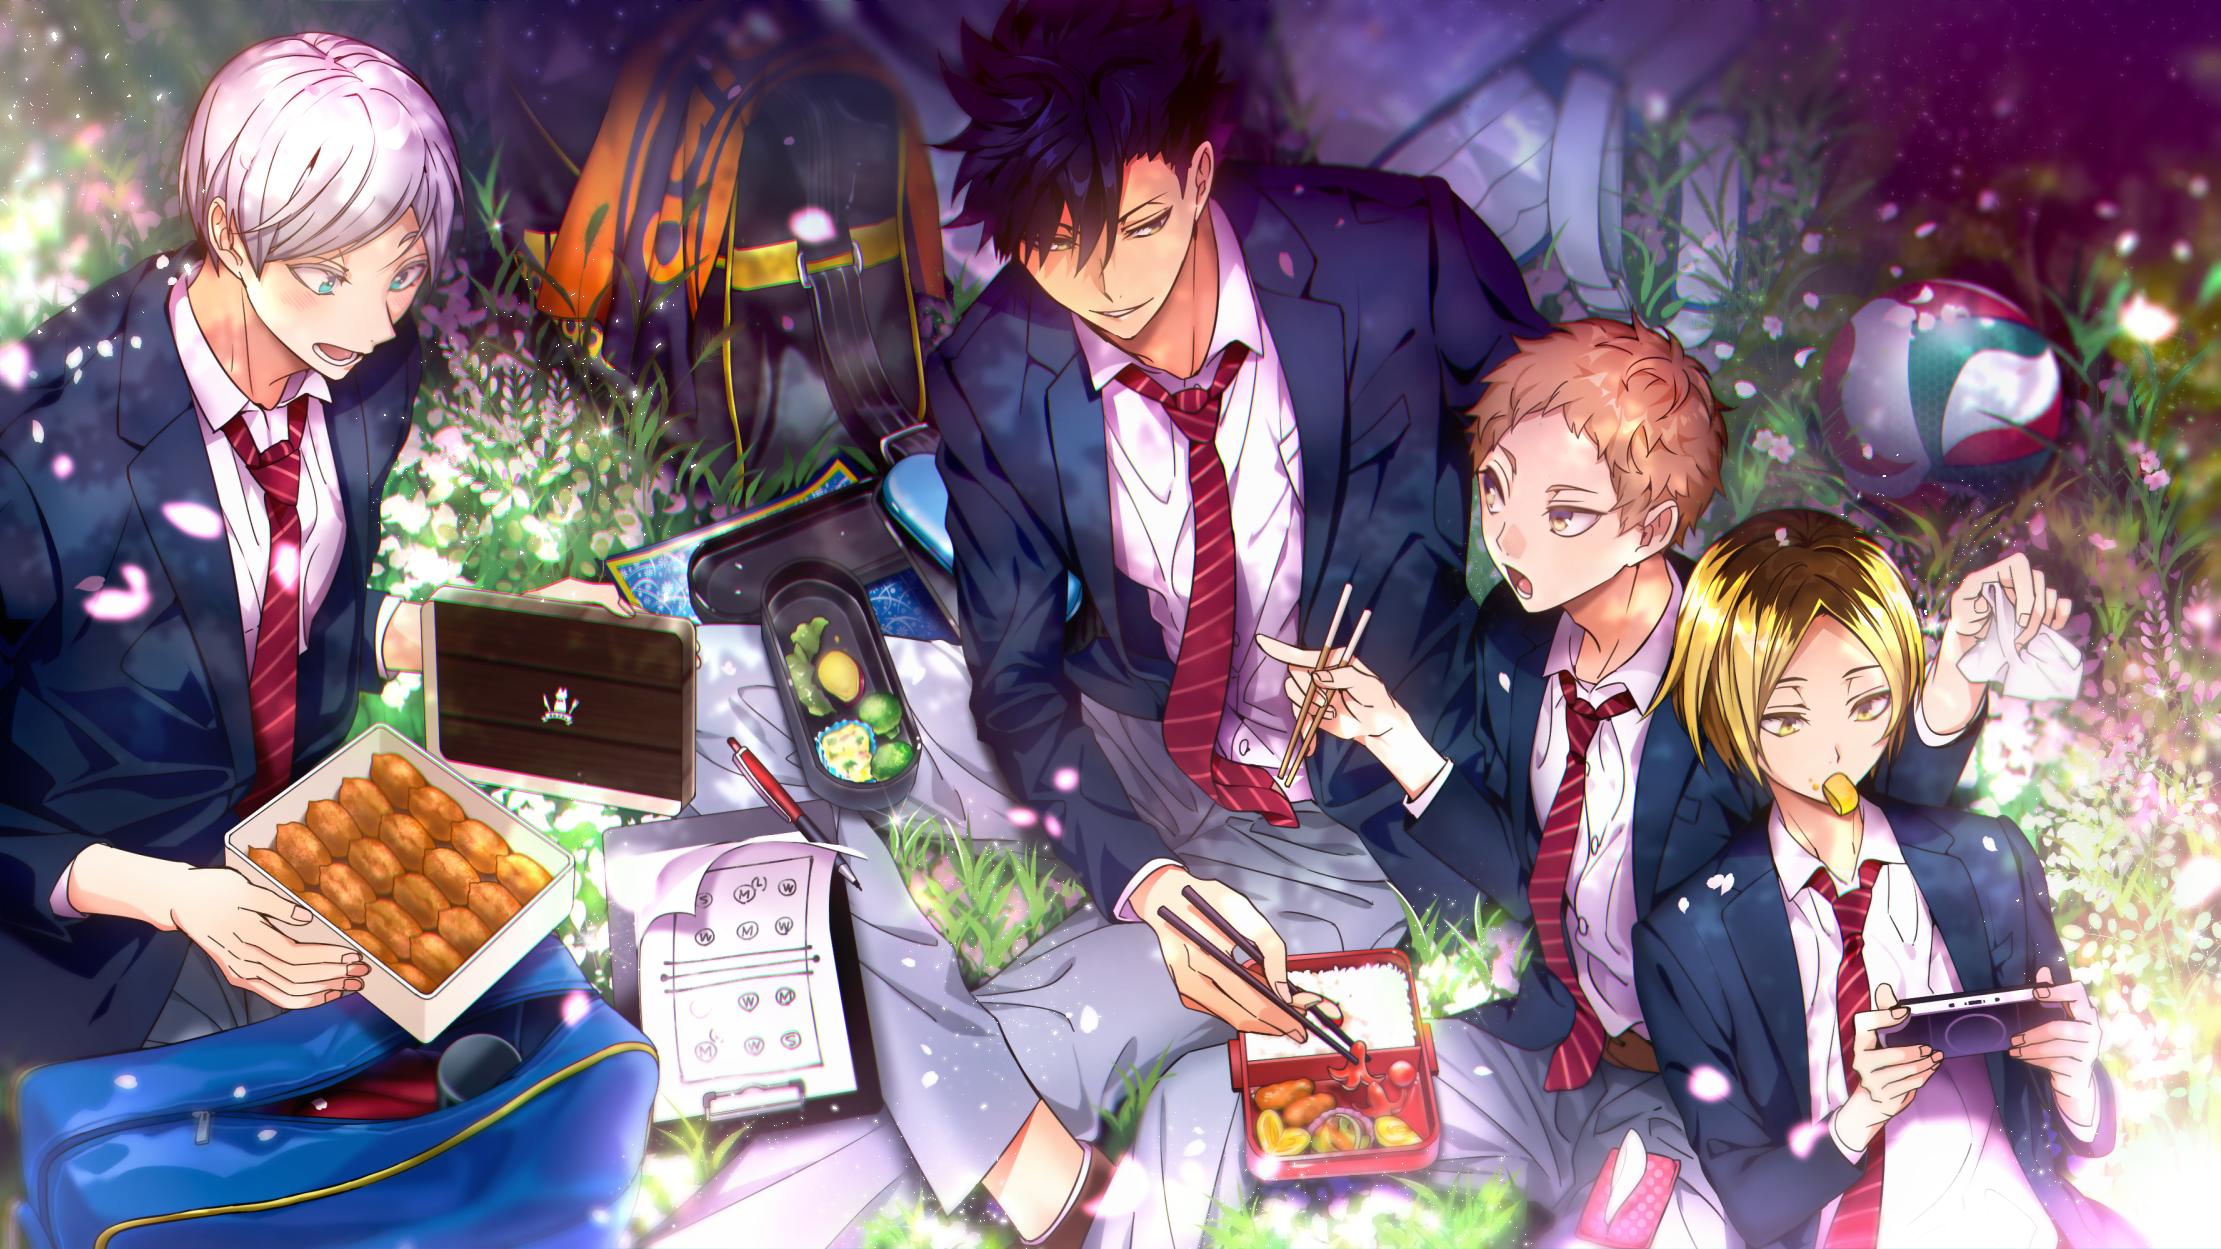 Nekoma High Haikyuu Image 2034496 Zerochan Anime Image Board